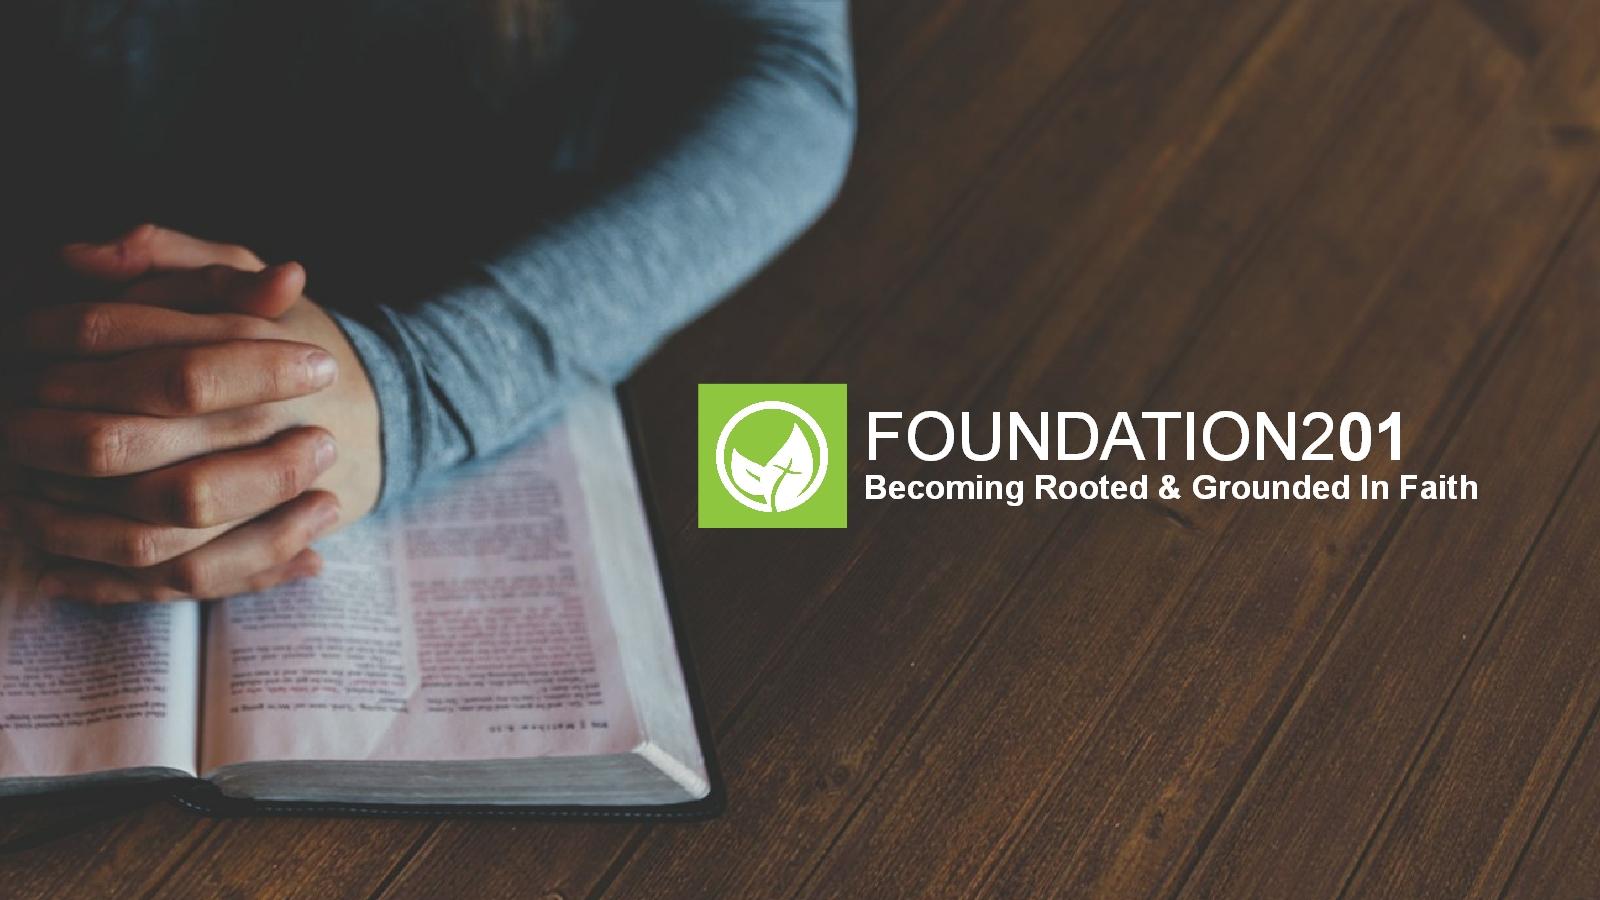 Foundation 201